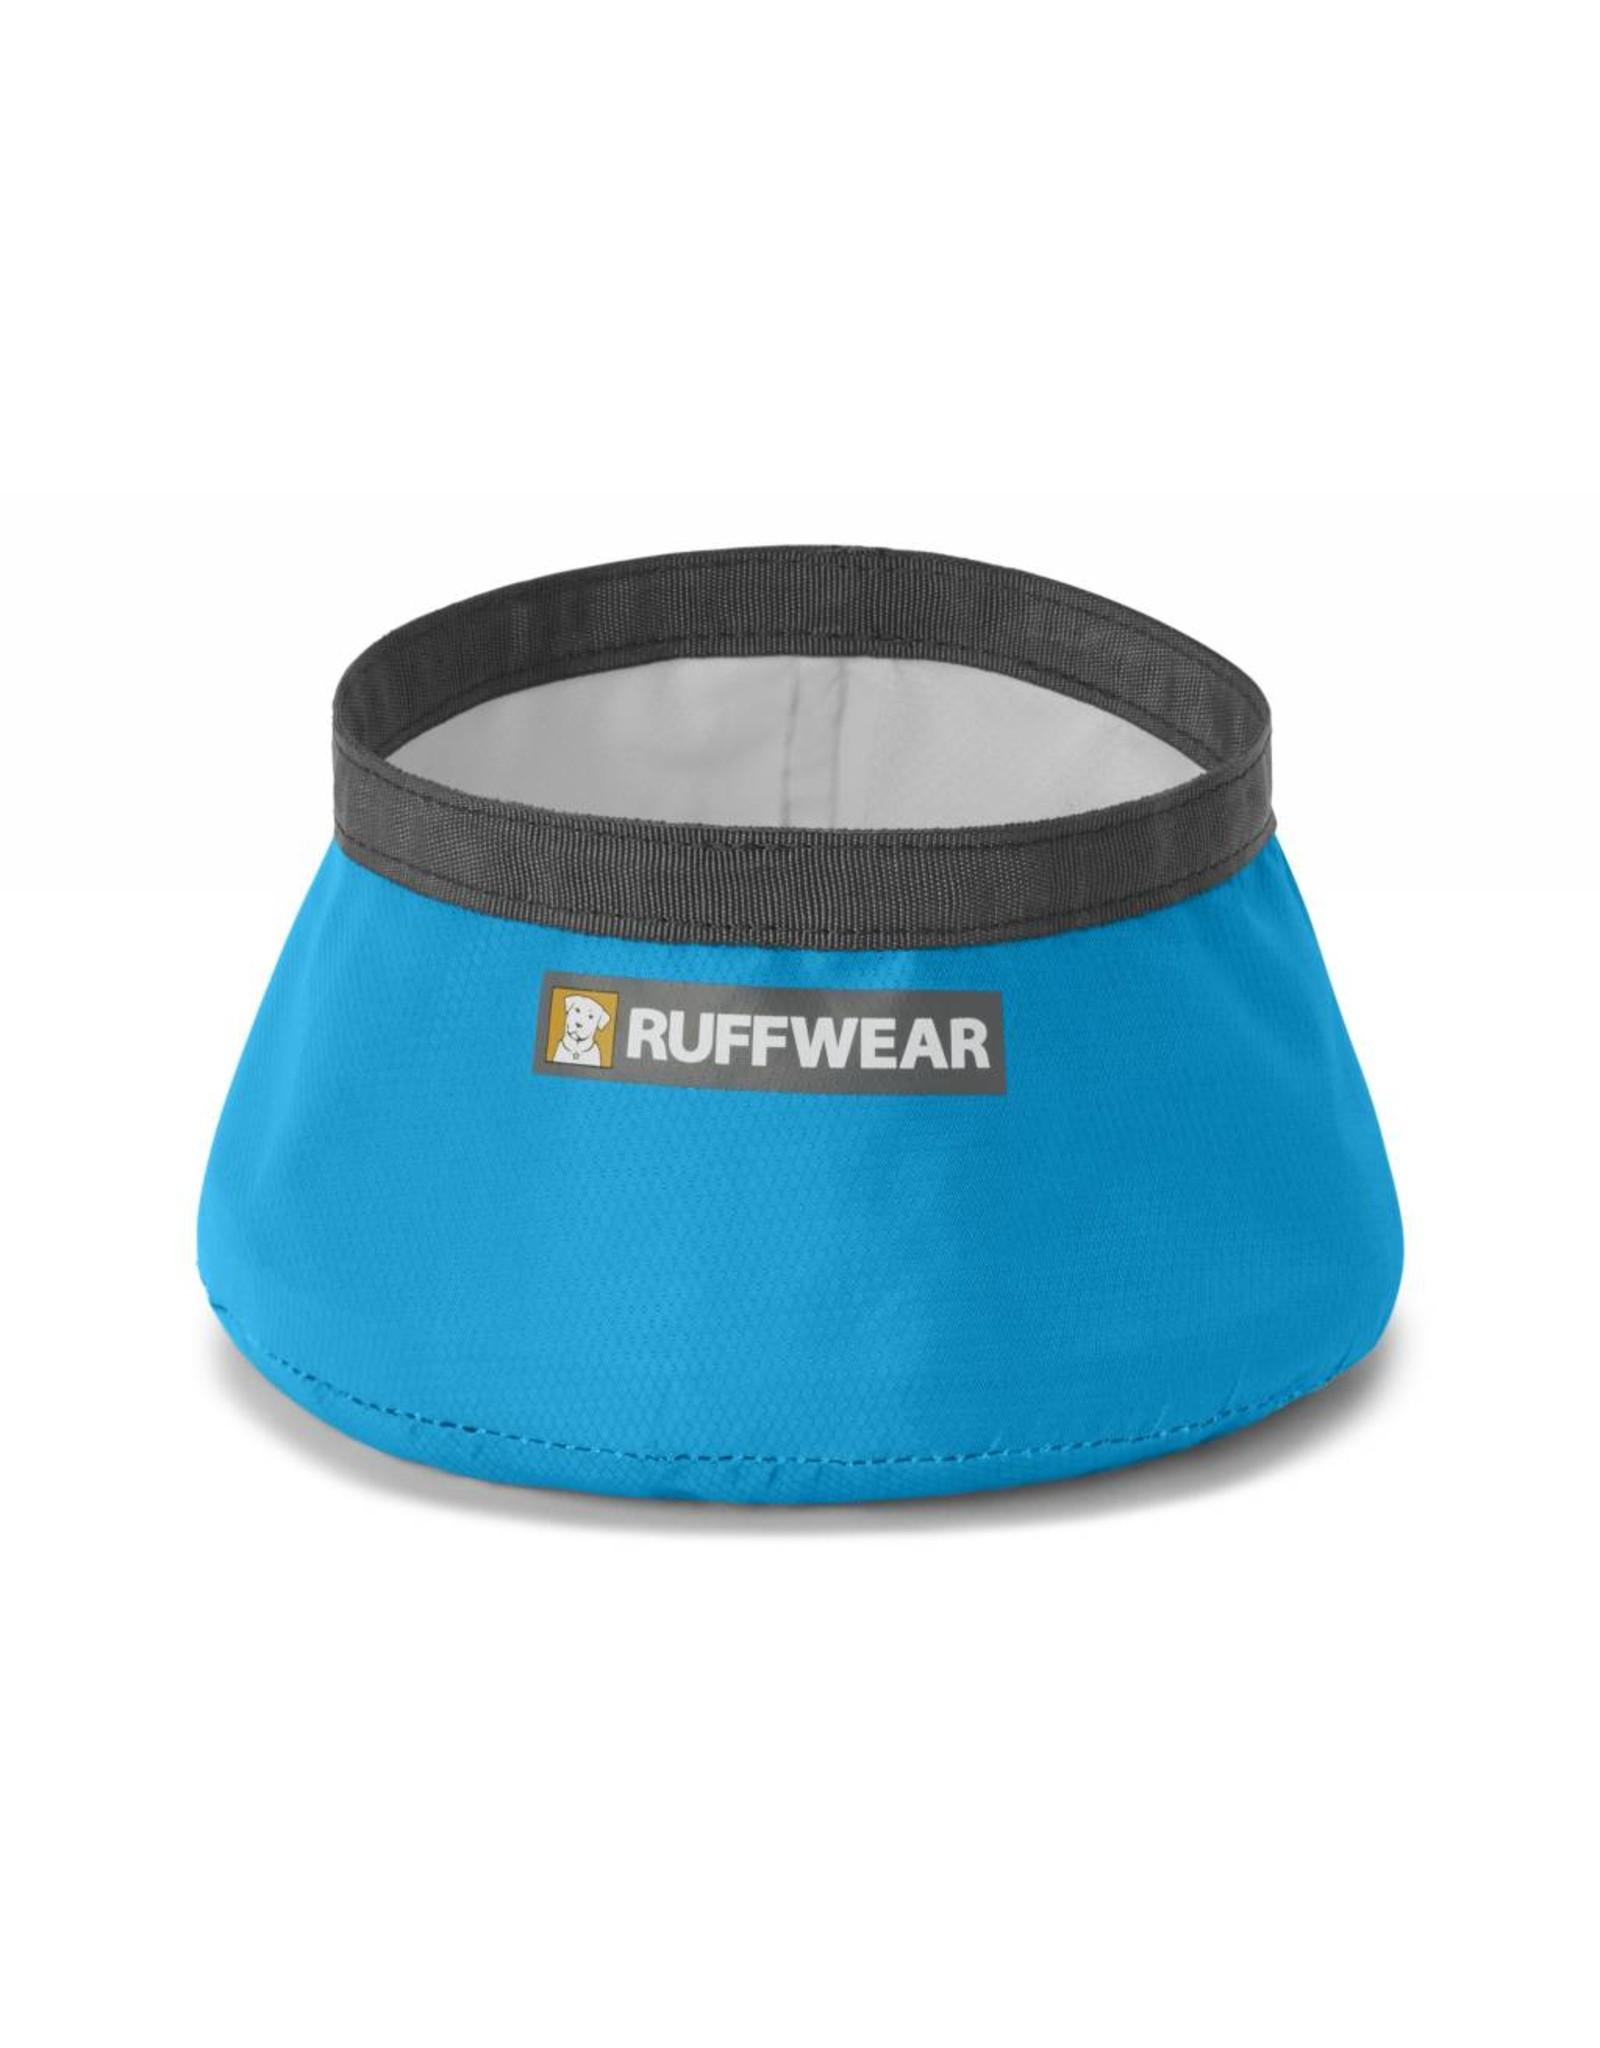 Ruffwear Trail Runner™ Bowl